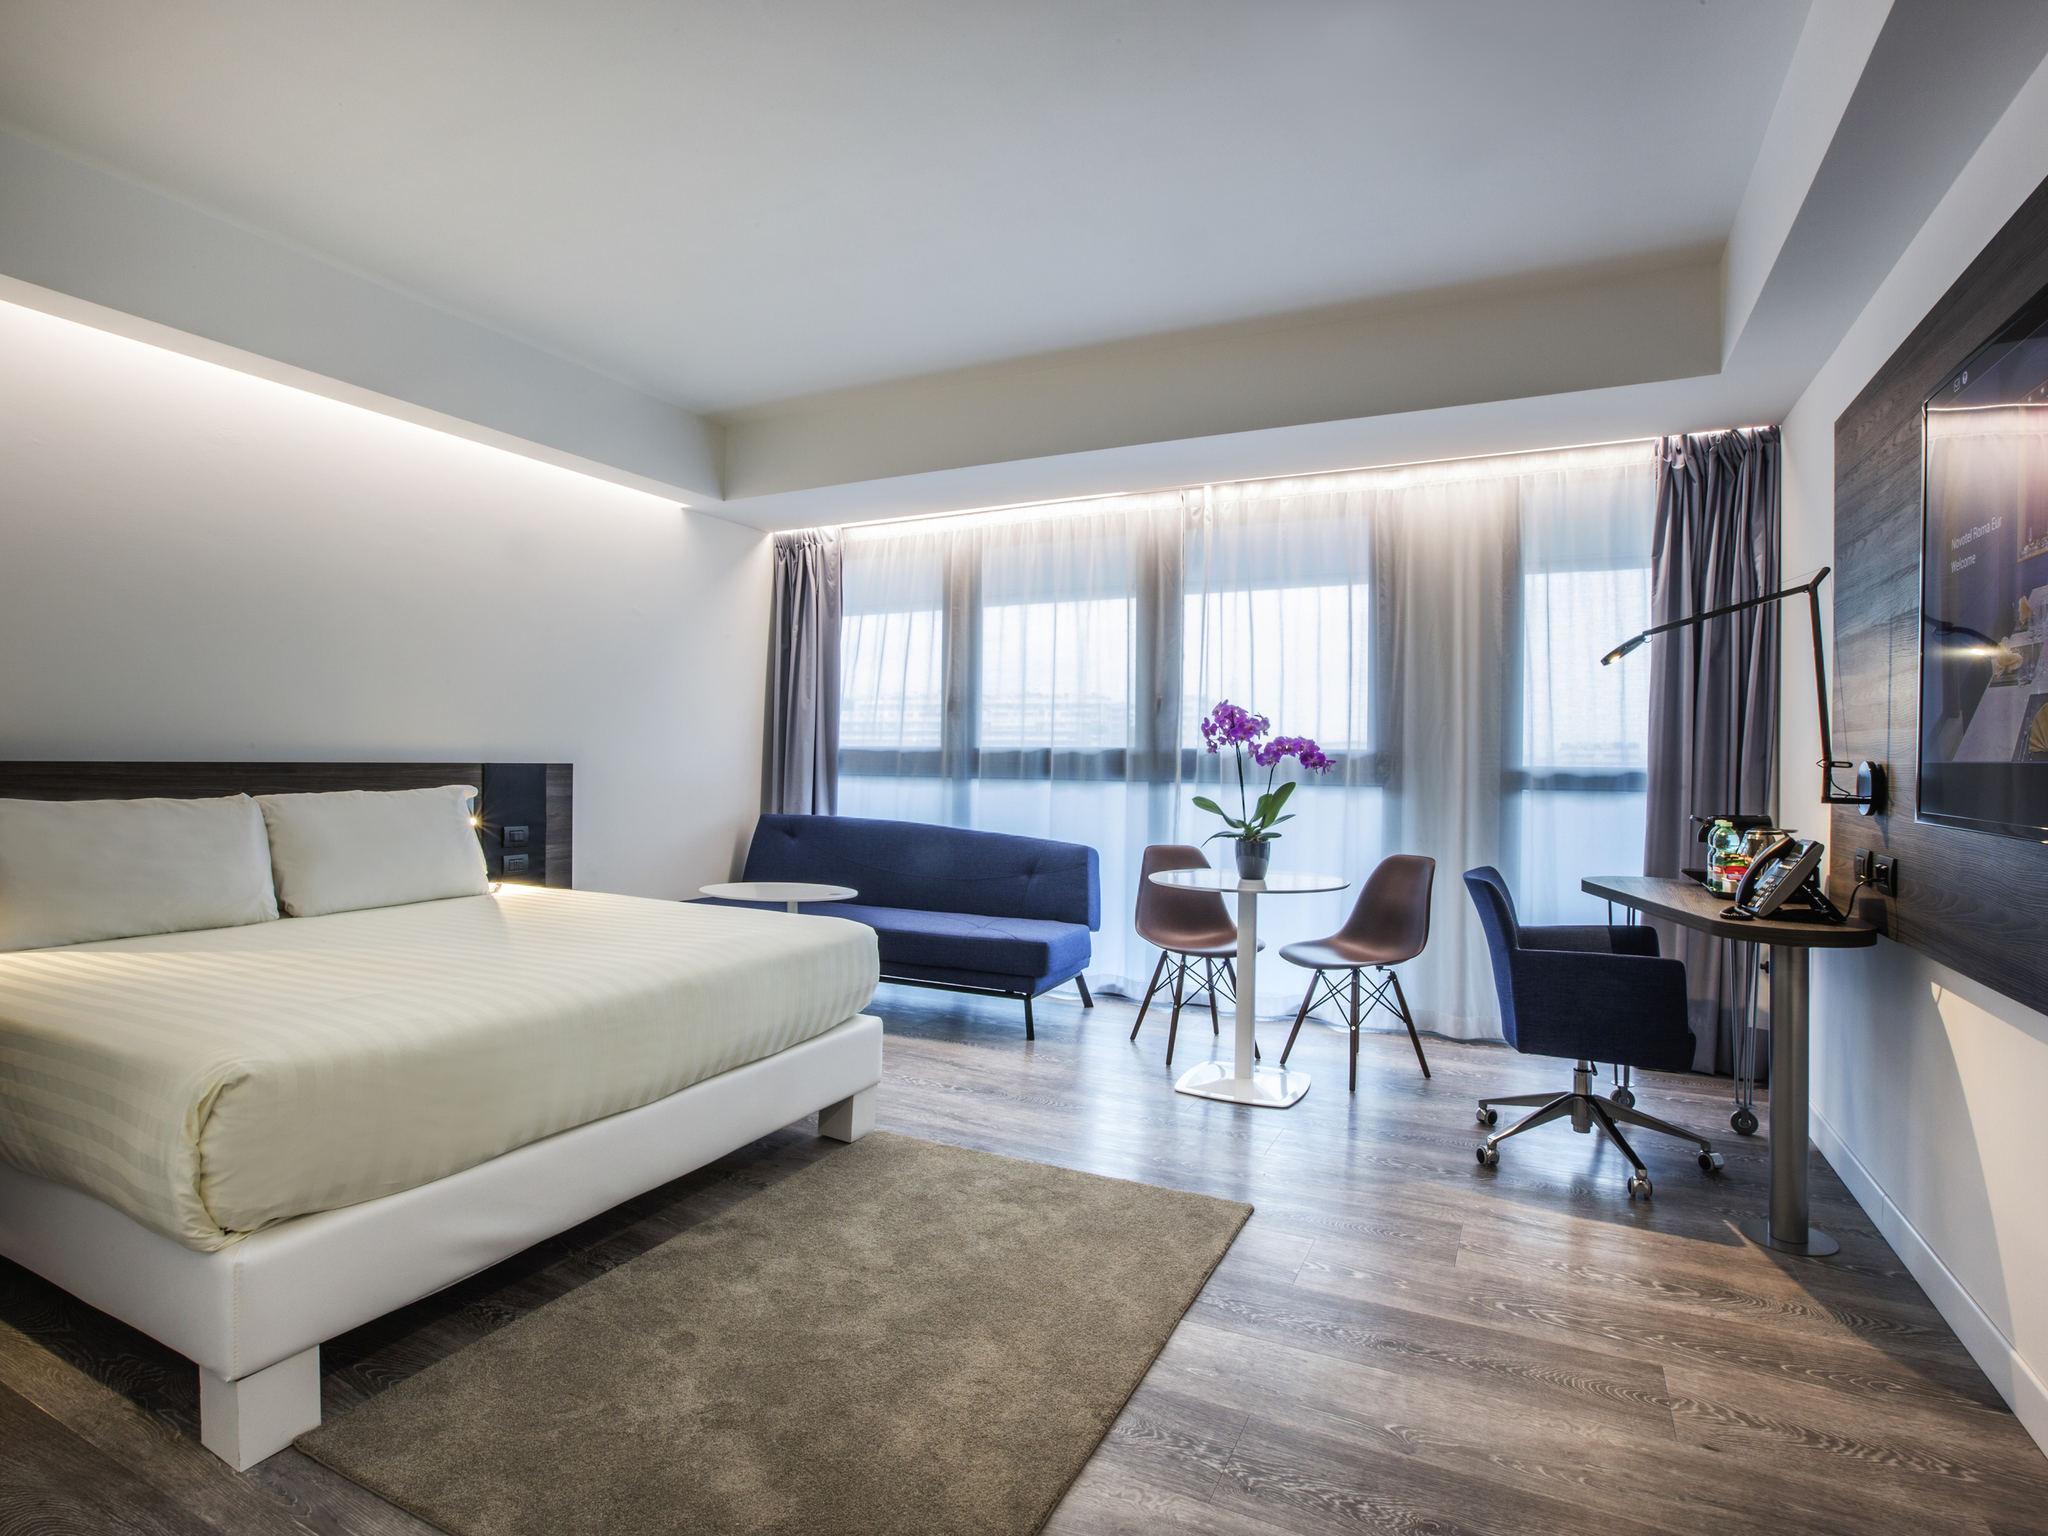 Amazing rooms novotel roma eur with interior designer roma - Interior designer roma ...